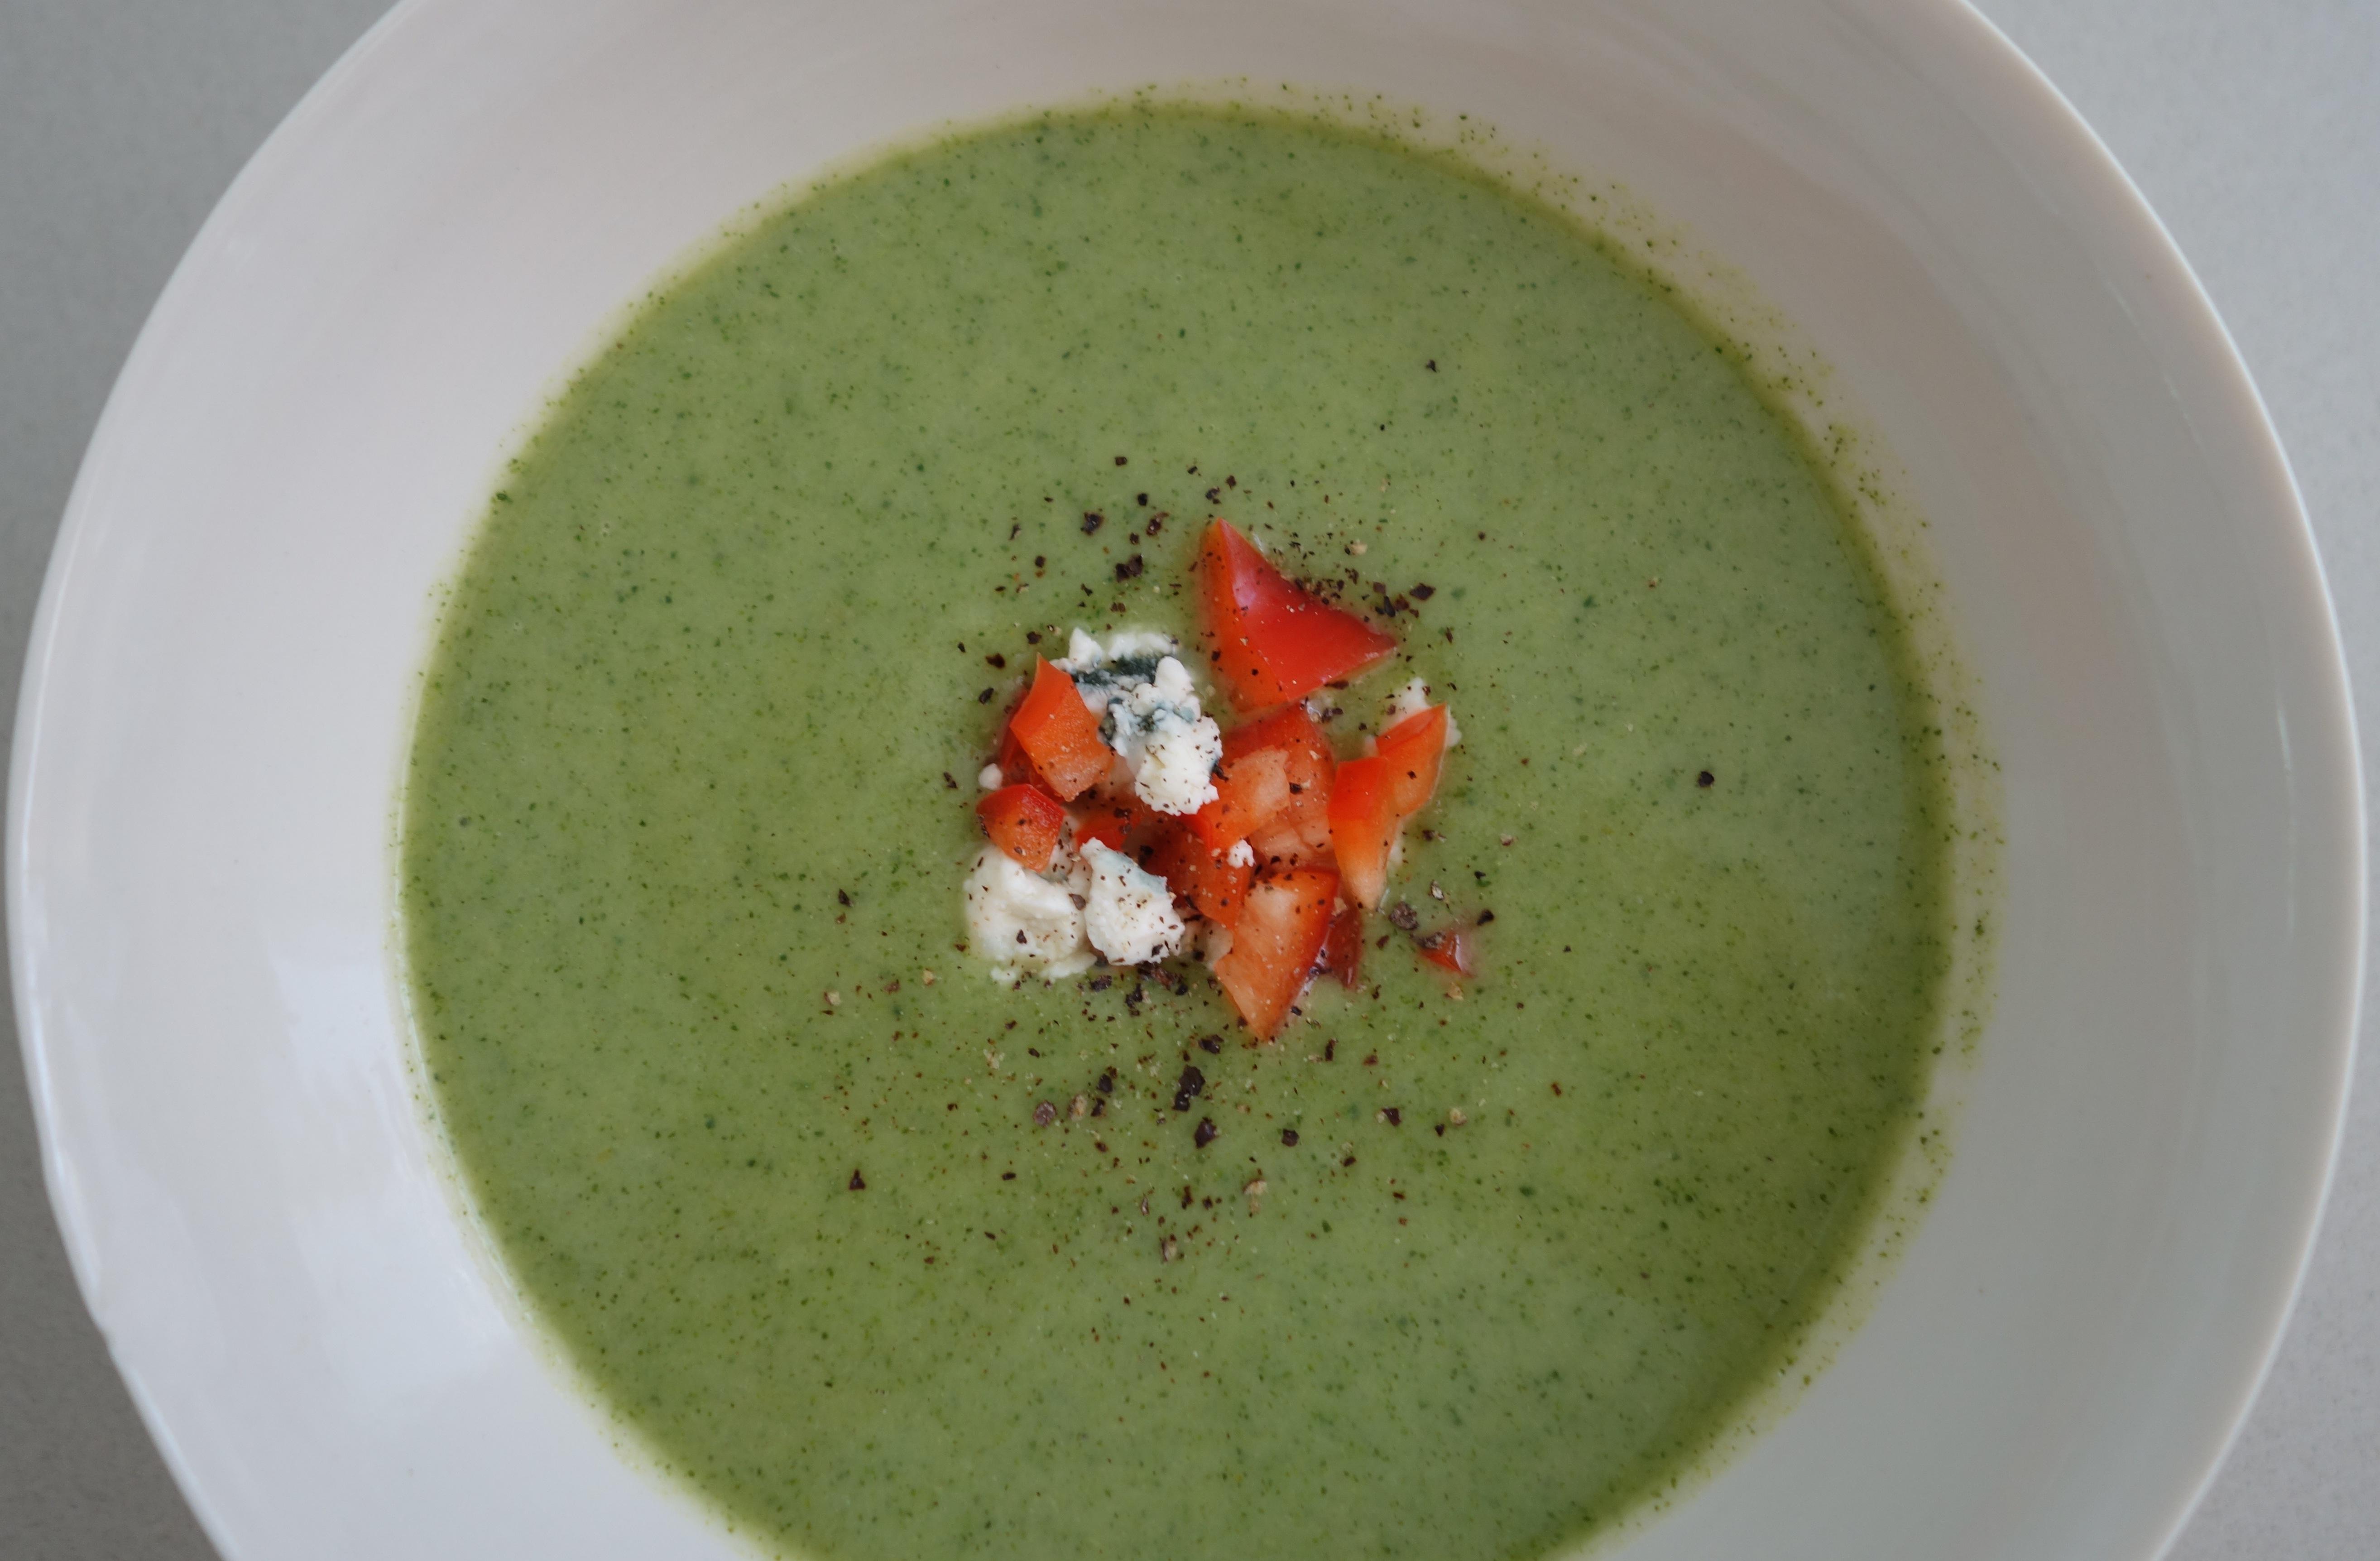 Chilled Broccoli Soup | Eaton Square Edibles